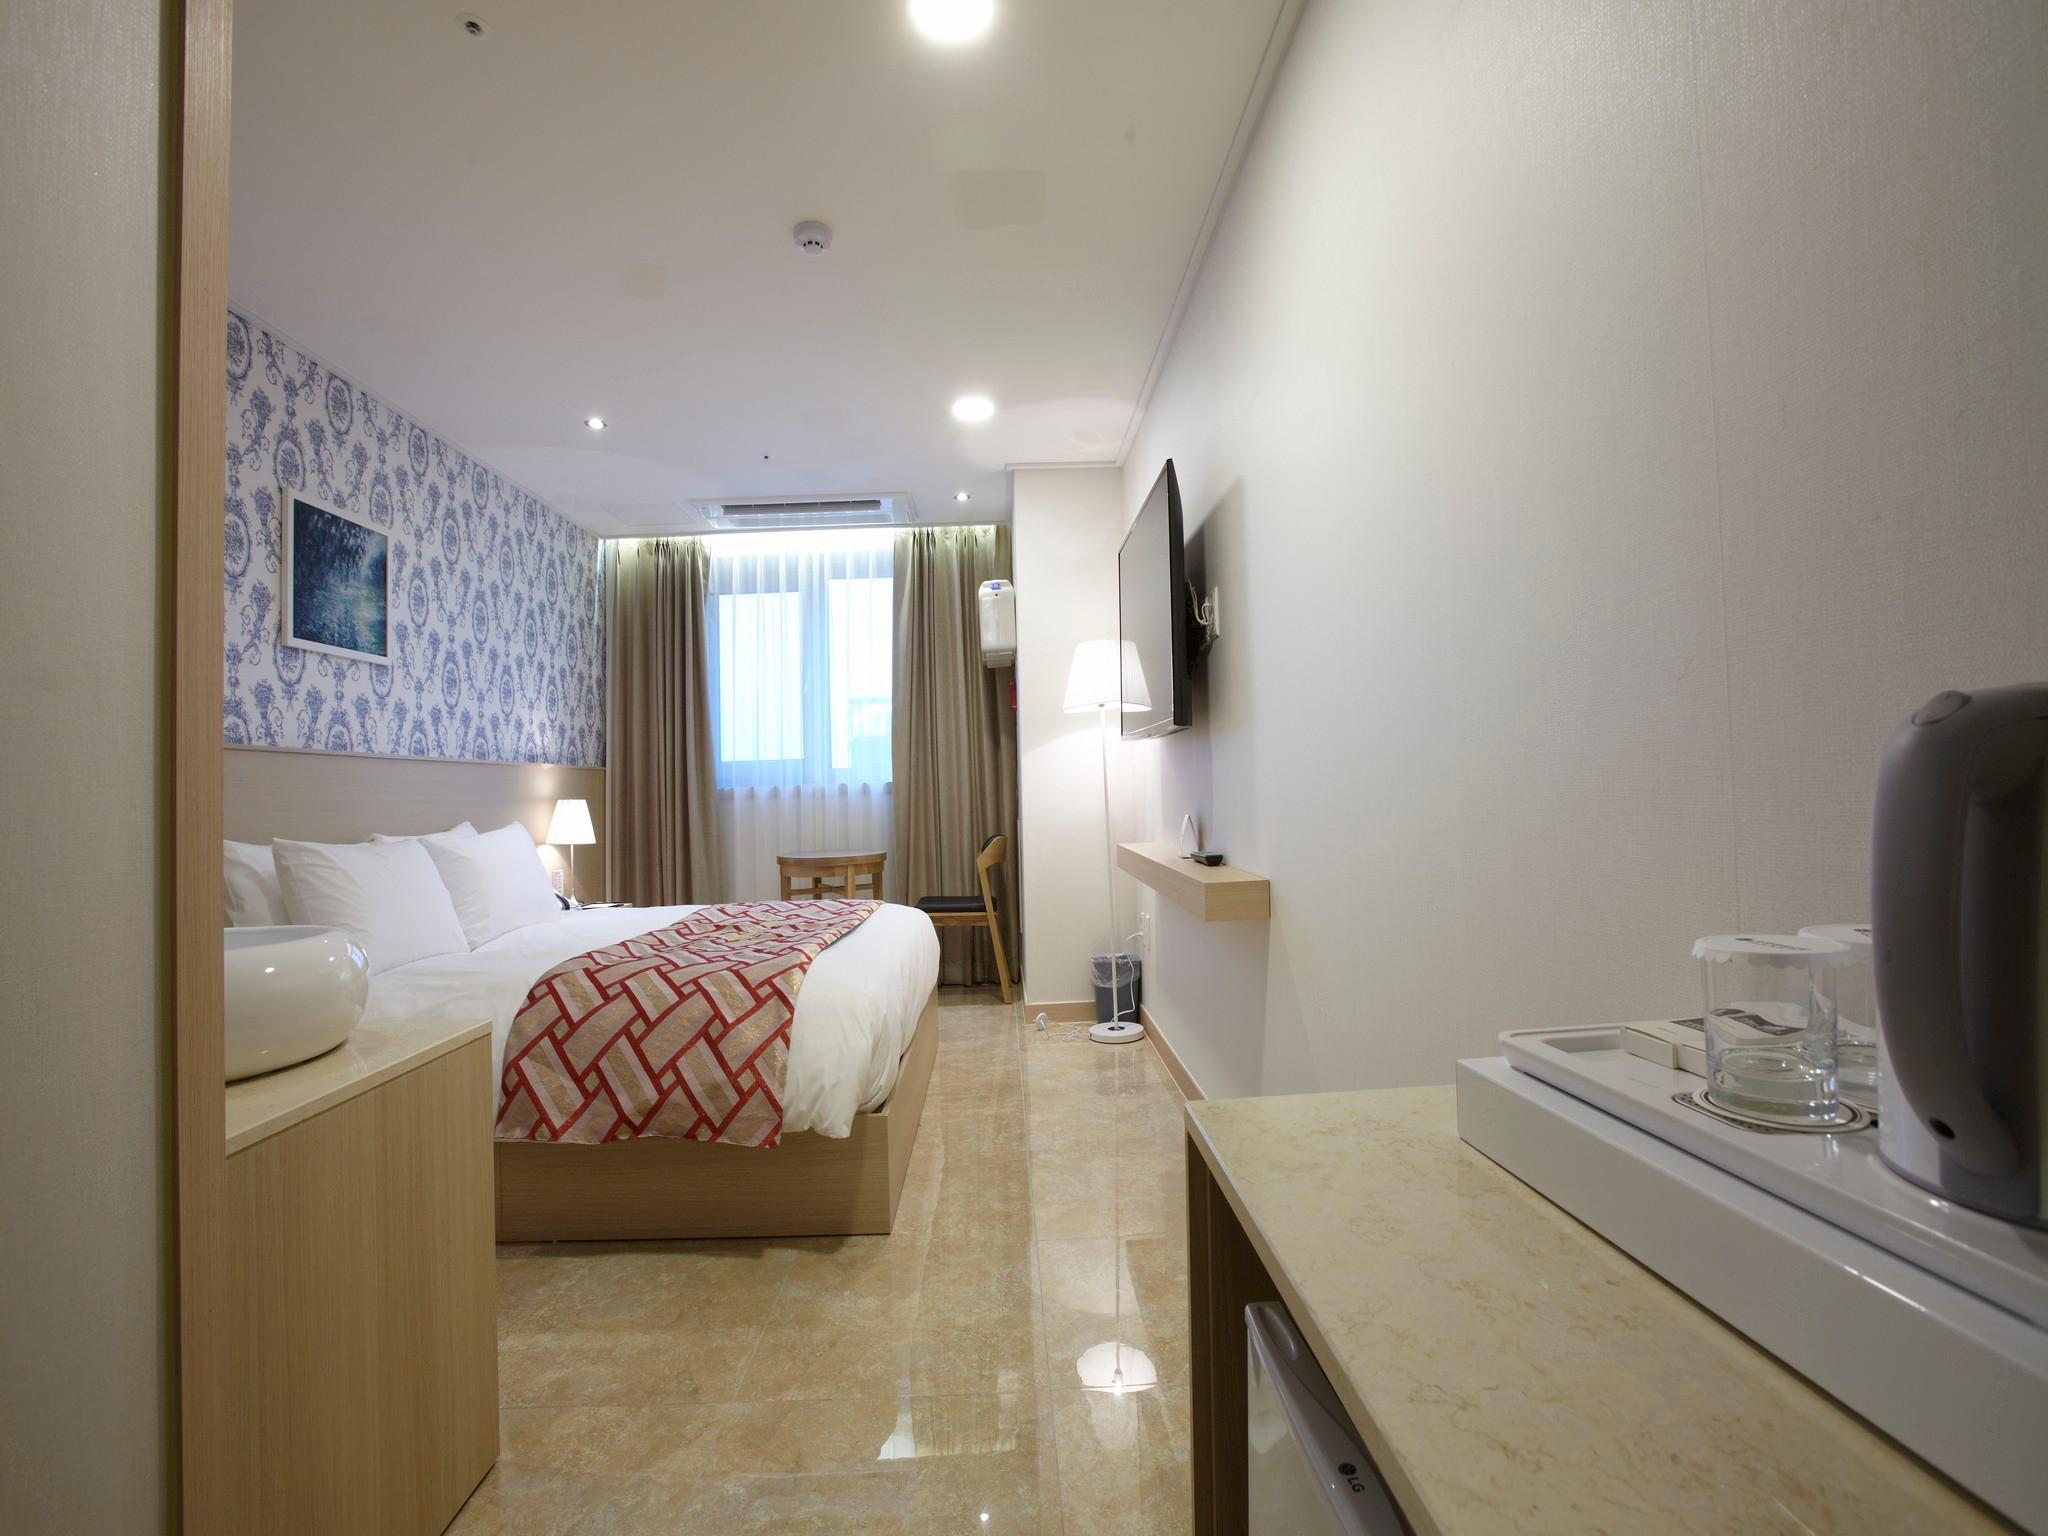 Hotel Sopra Incheon Cheongna, Seo